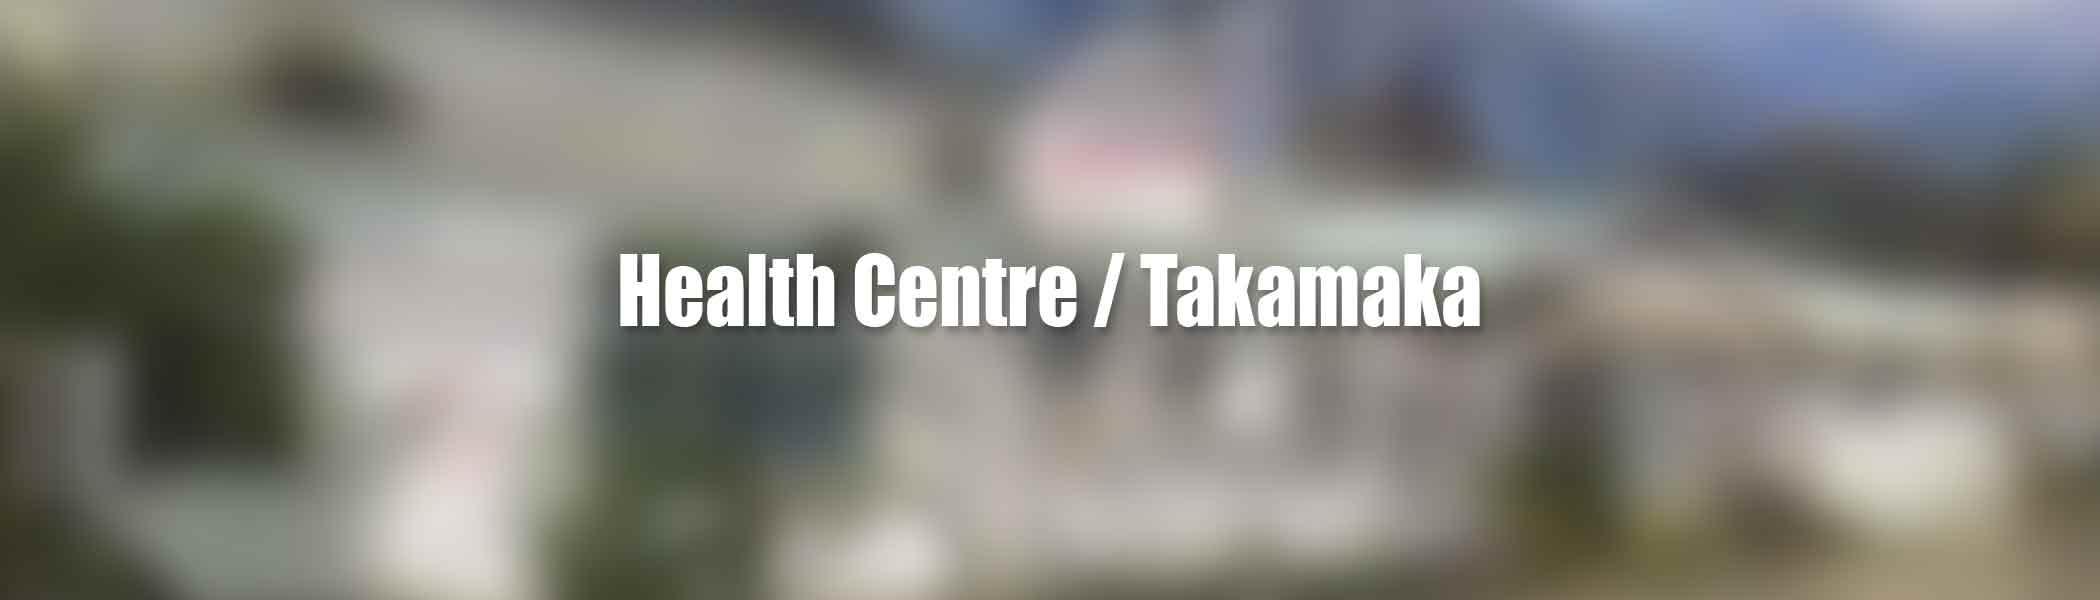 health-centre-takamaka, Health Centres in Seychelles Islands